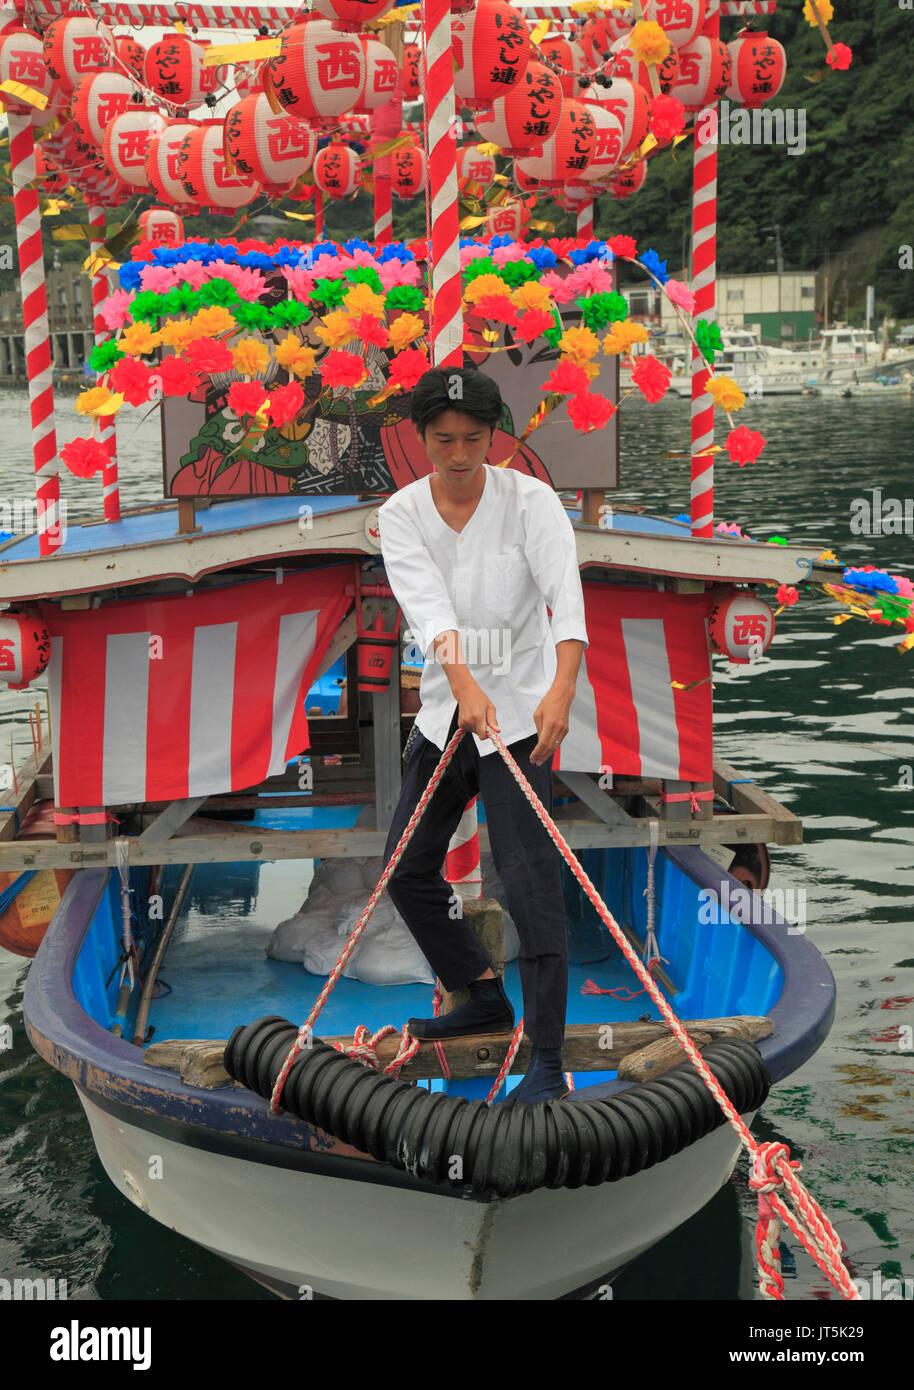 Japan, Manazuru, Kibune Matsuri, festival, boat, people, - Stock Image